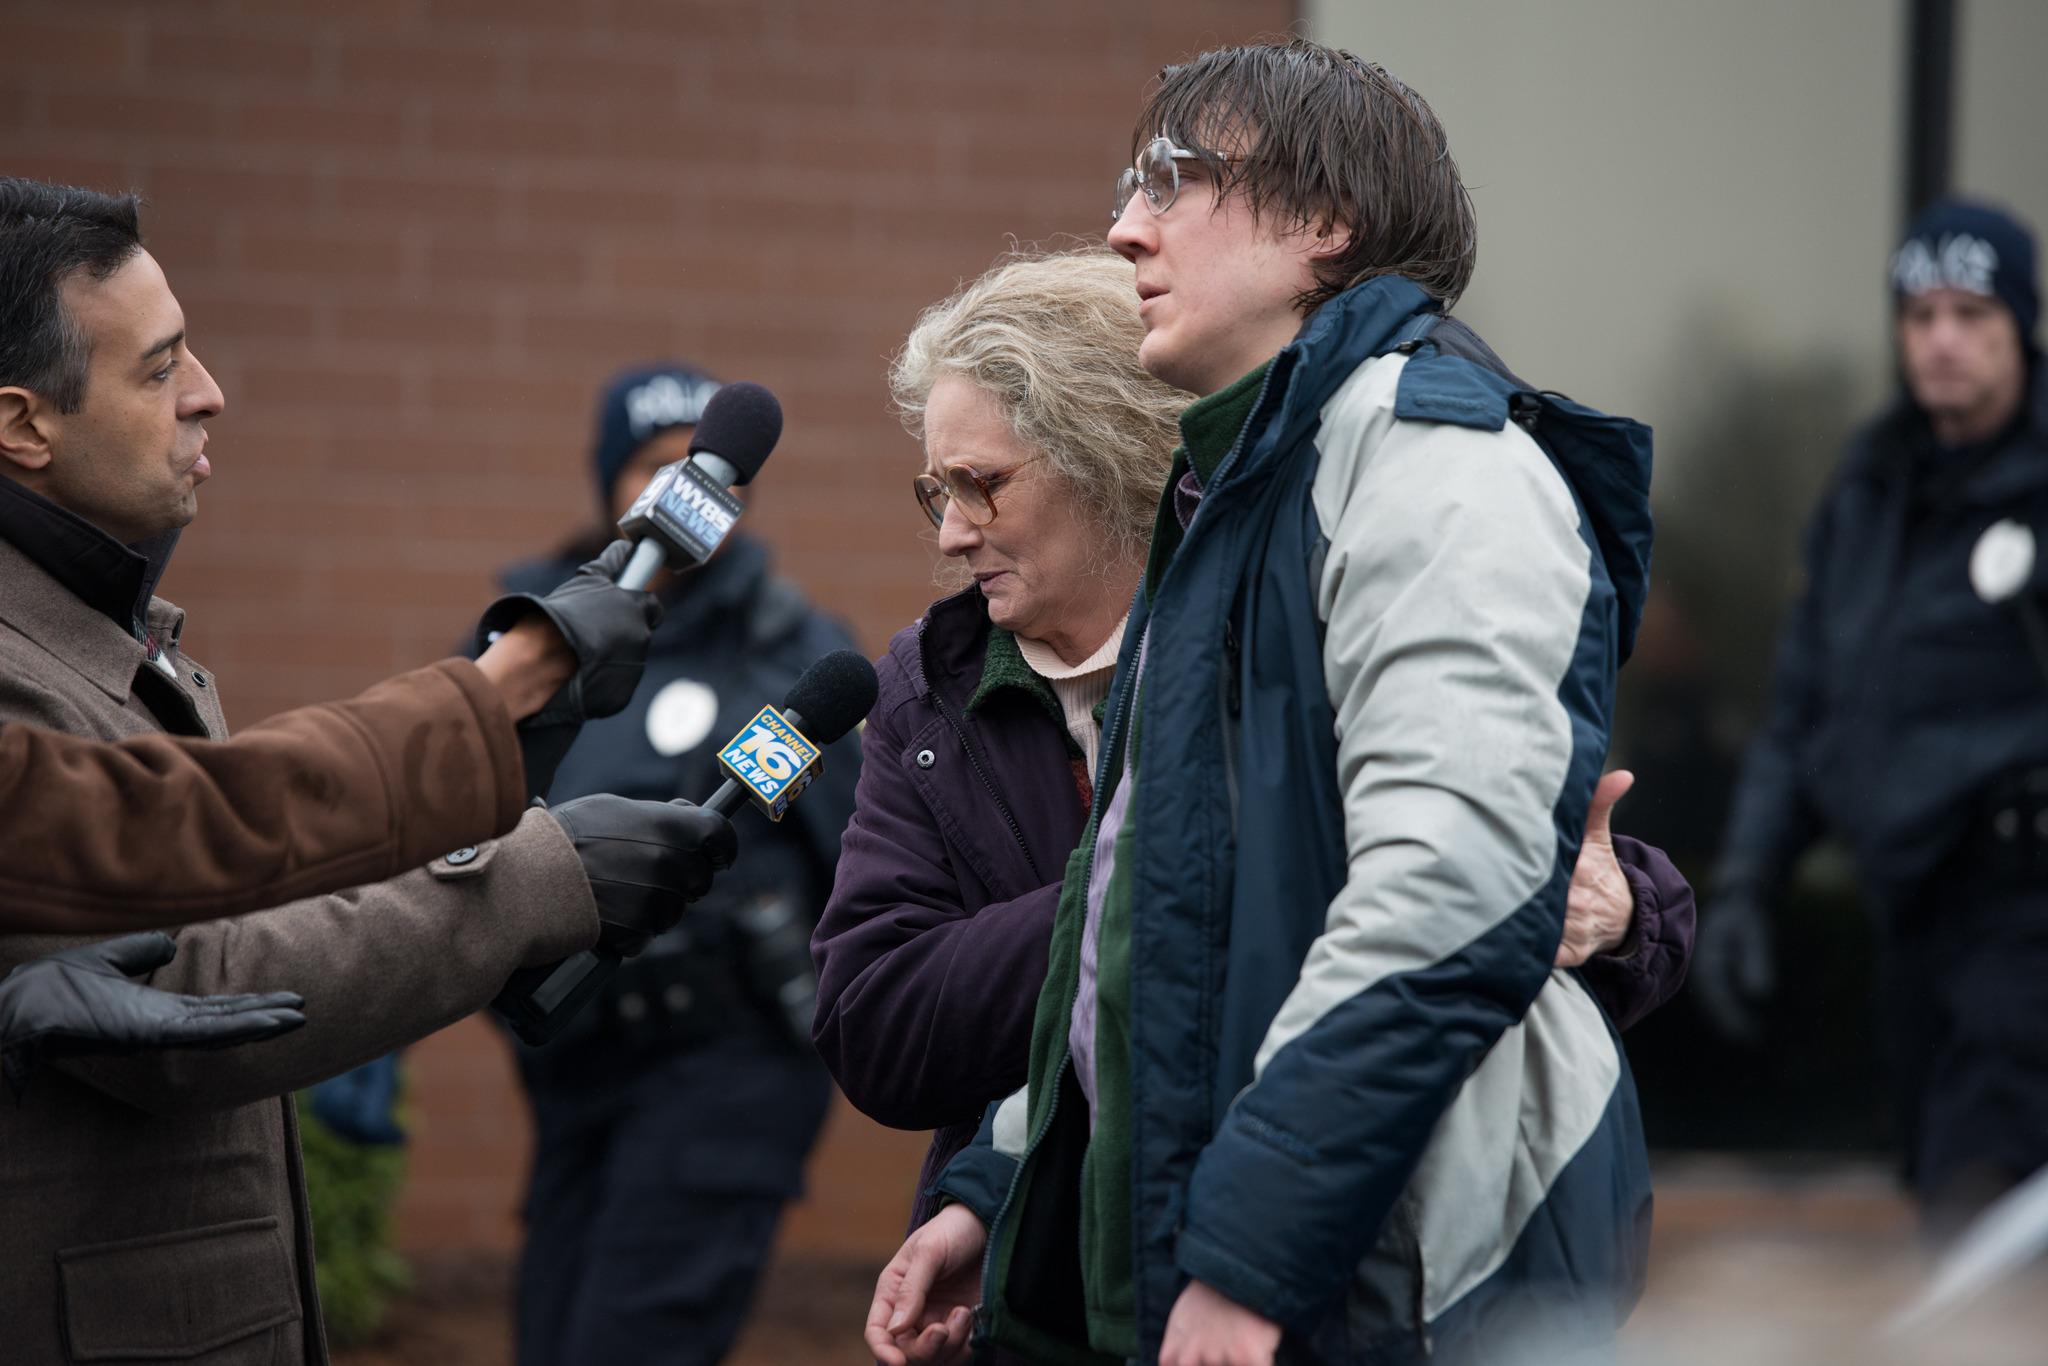 Paul Dano and Melissa Leo in Prisoners (2013)